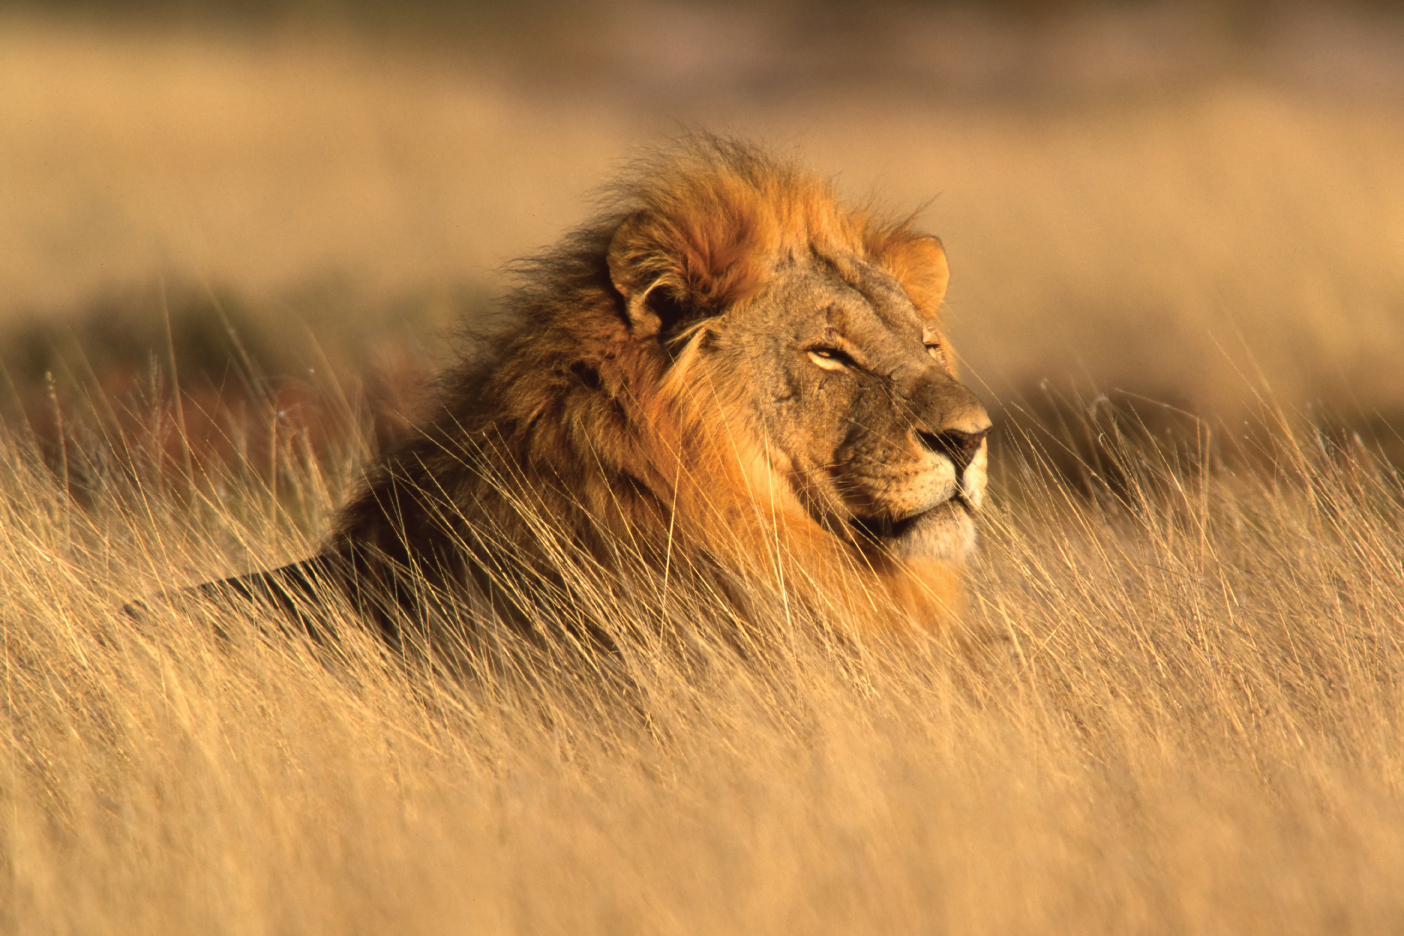 Africa Lion, Travel Africa, Africa Safari Guide, Luxury African Safari